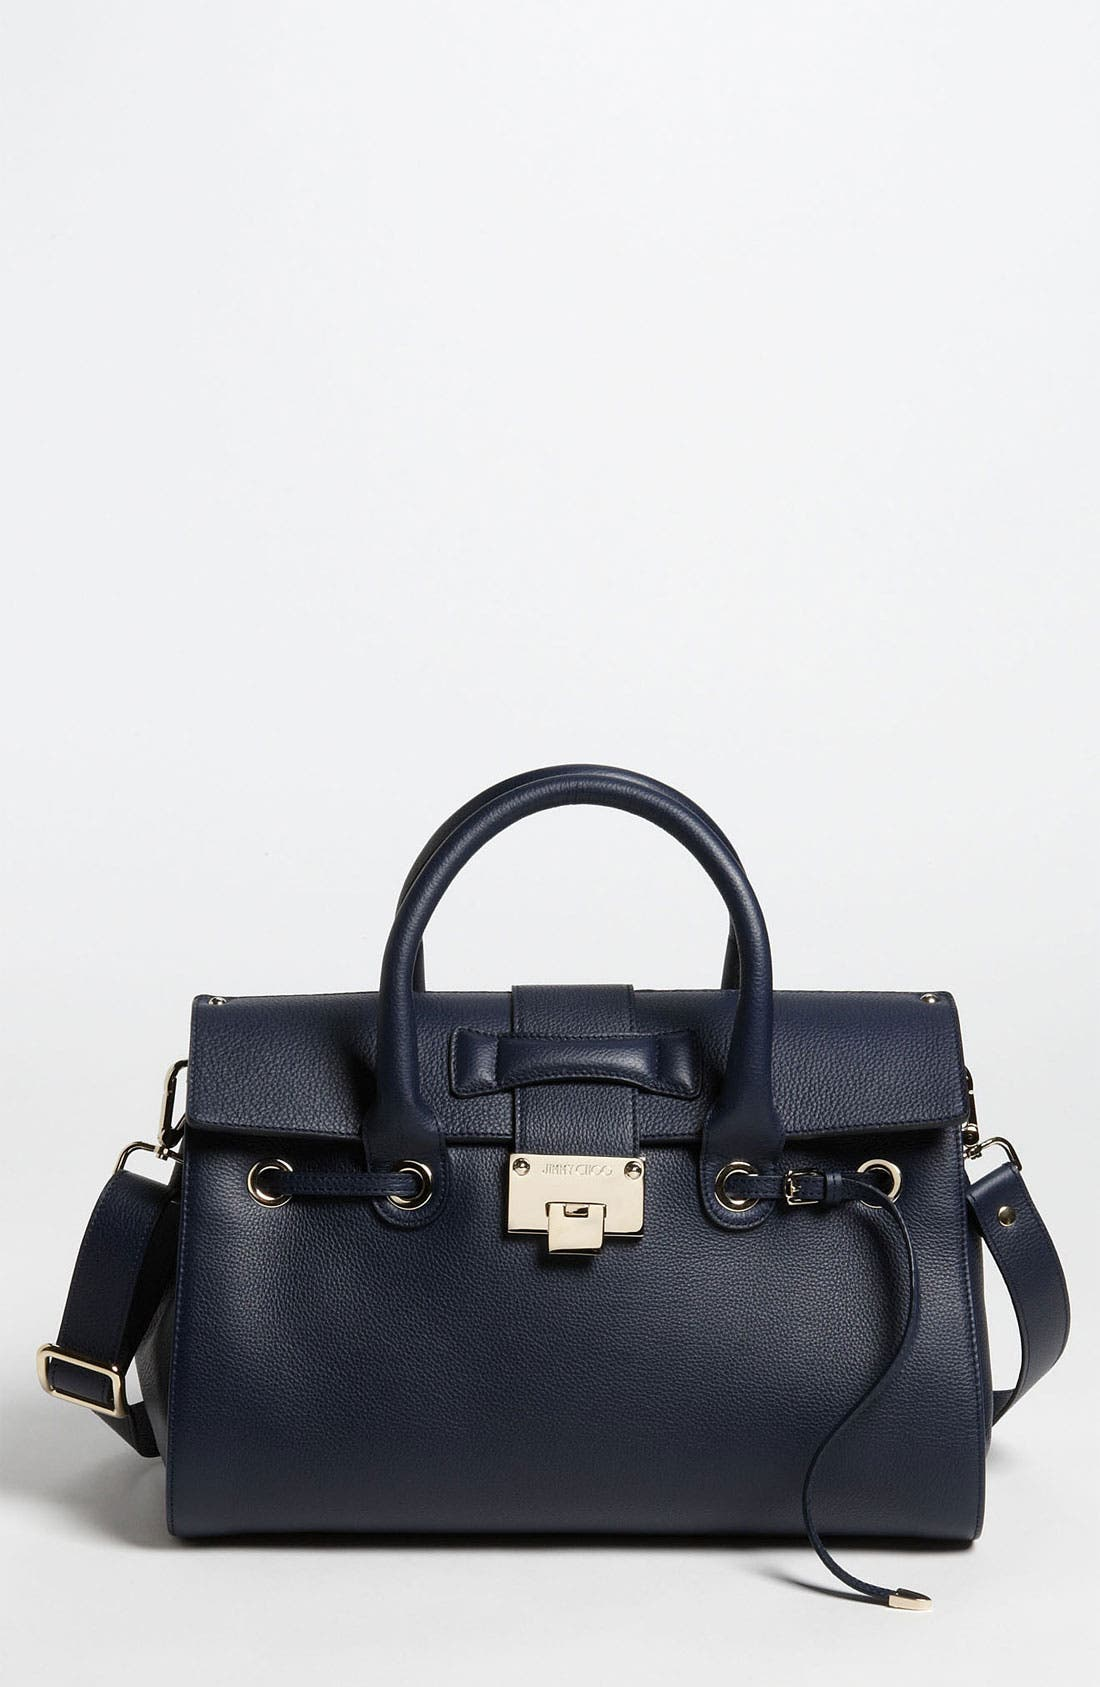 Main Image - Jimmy Choo 'Rosalie' Leather Satchel